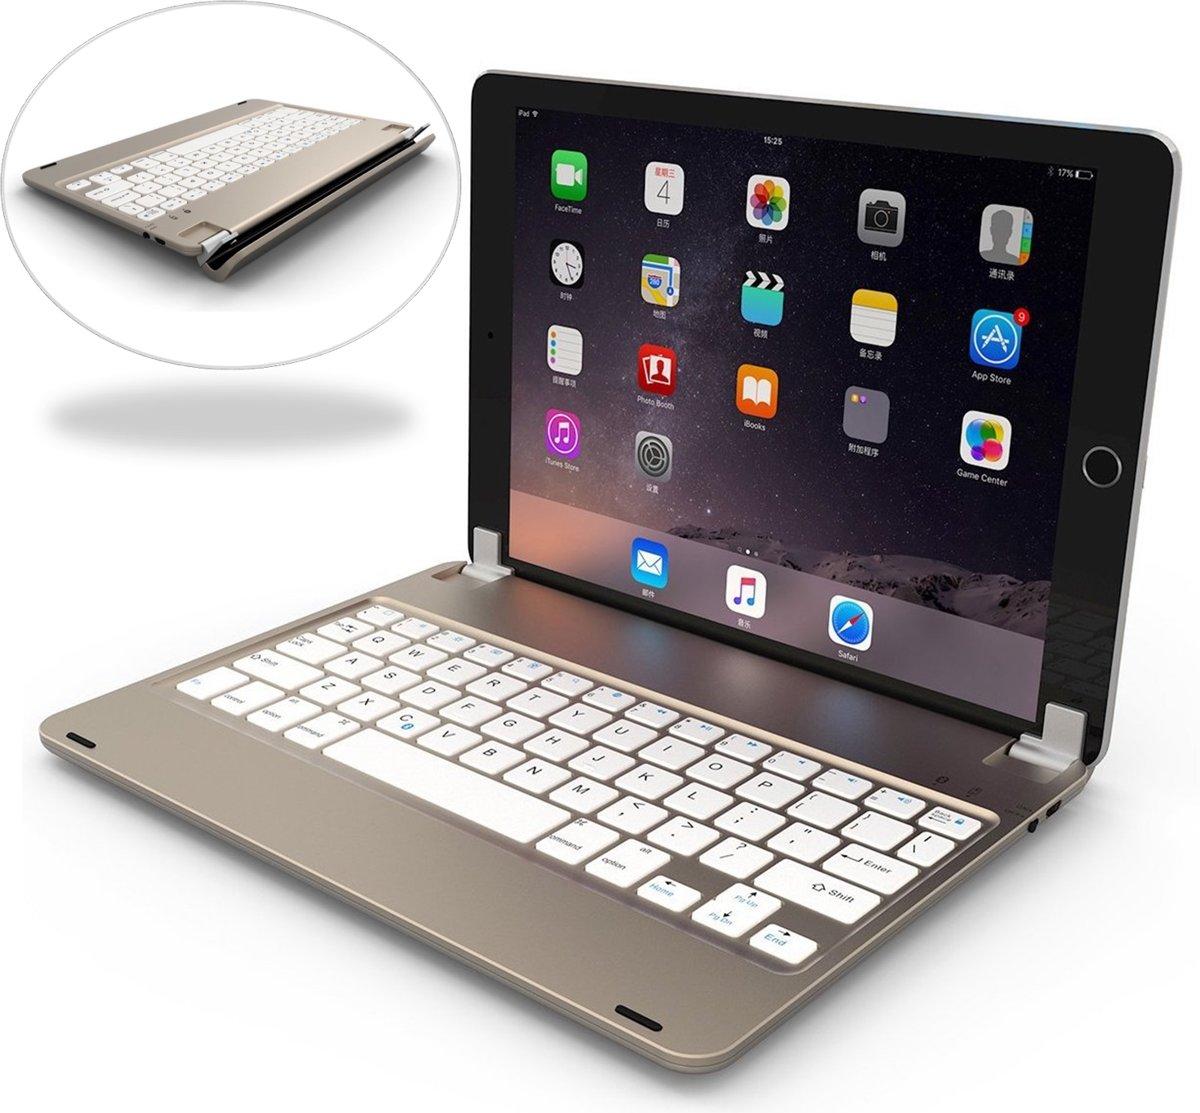 Apple iPad 9.7 (2017 / 2018) Toetsenbord Hoes Bluetooth Keyboard Case - Goud - van iCall